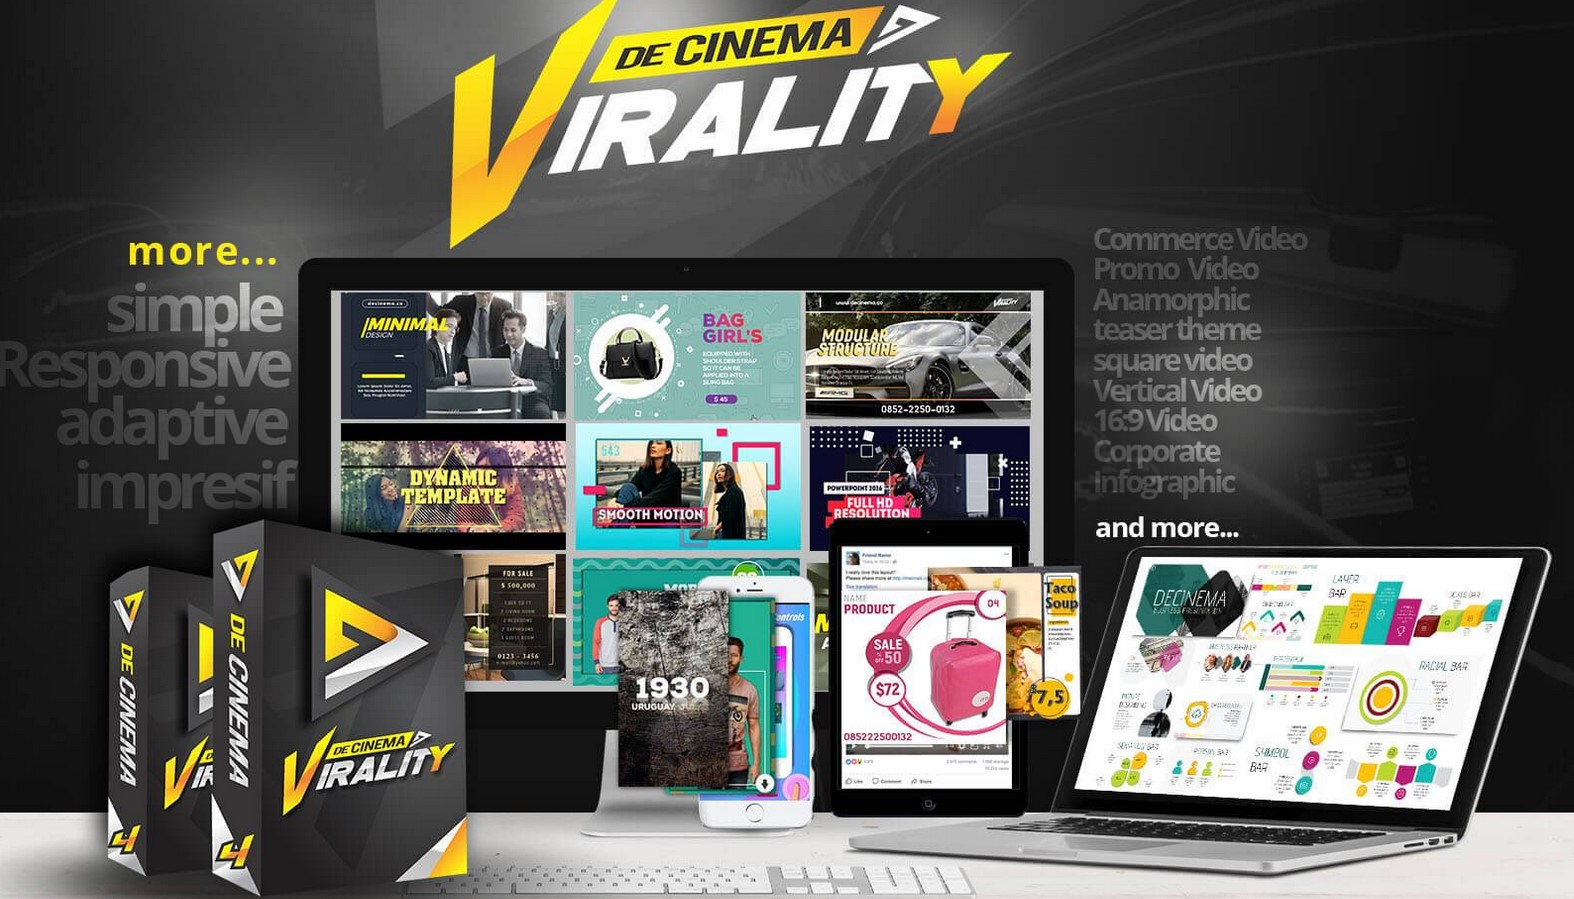 Decinema VIRALITY + Premium Version(2018)